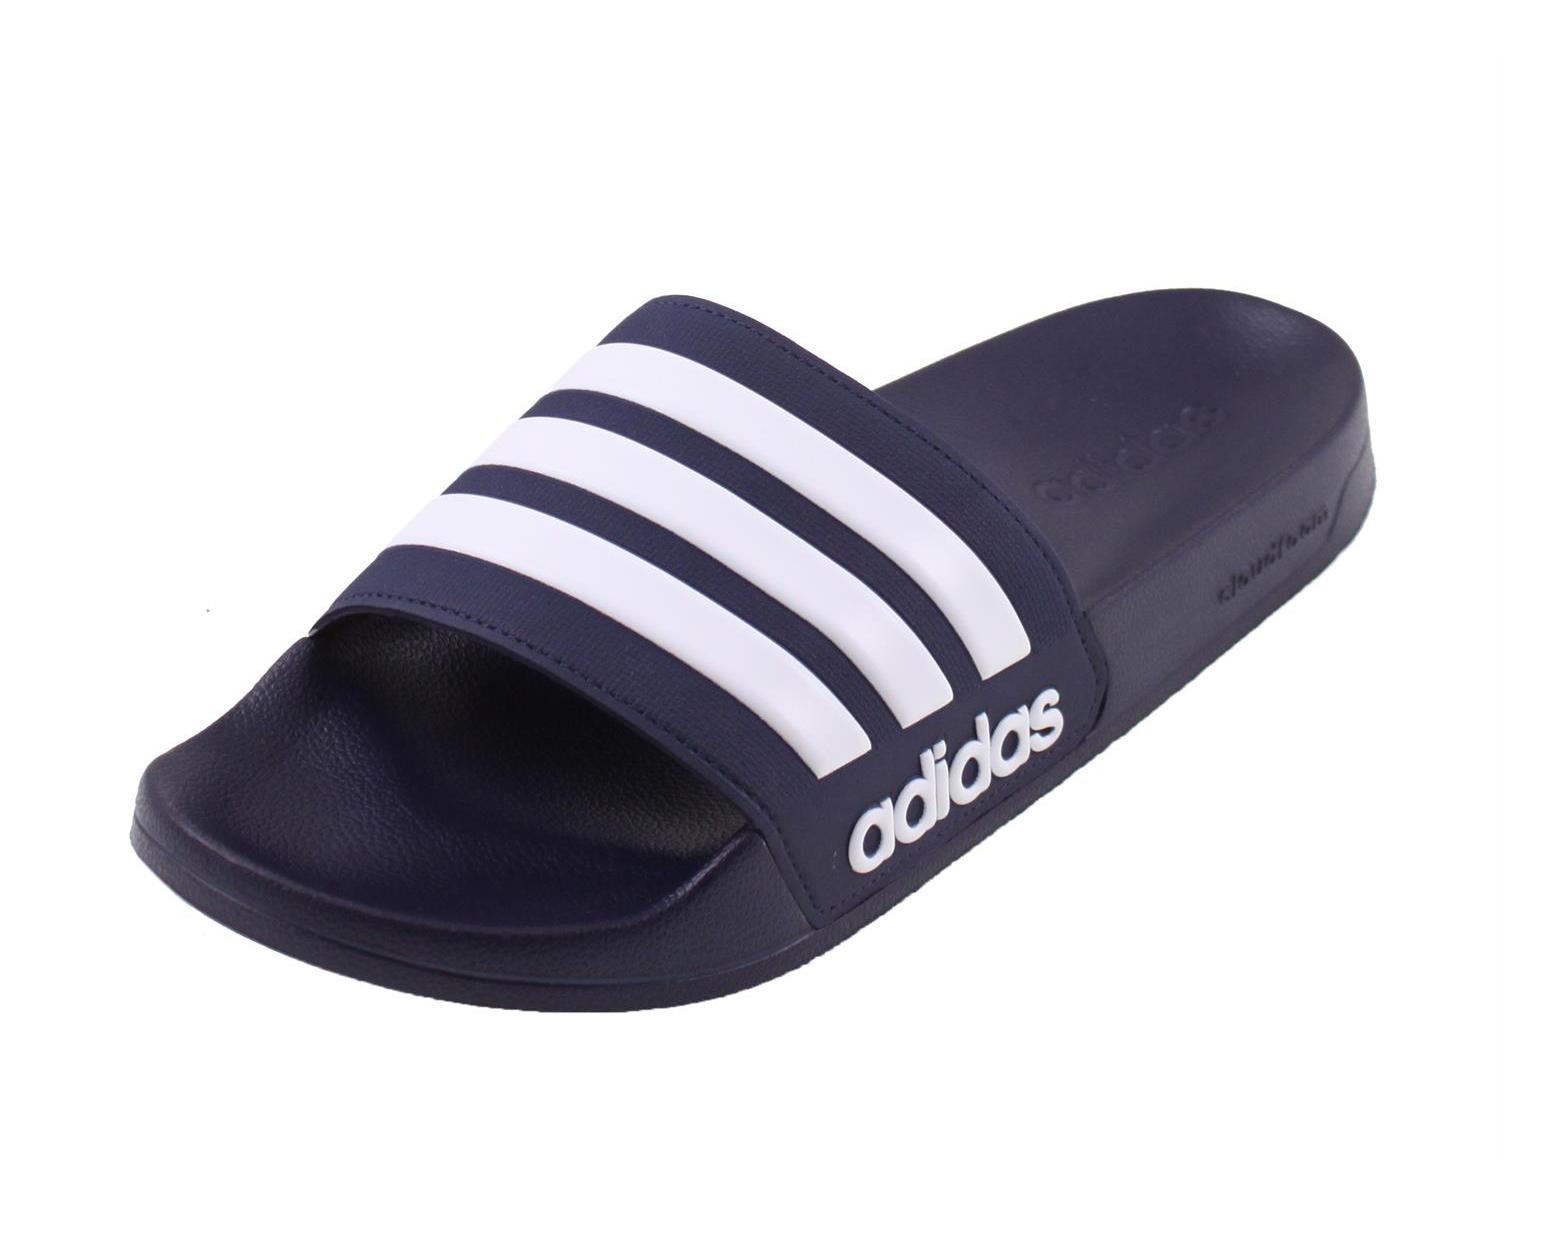 Adidas Adilette Cloudfoam Badslipper